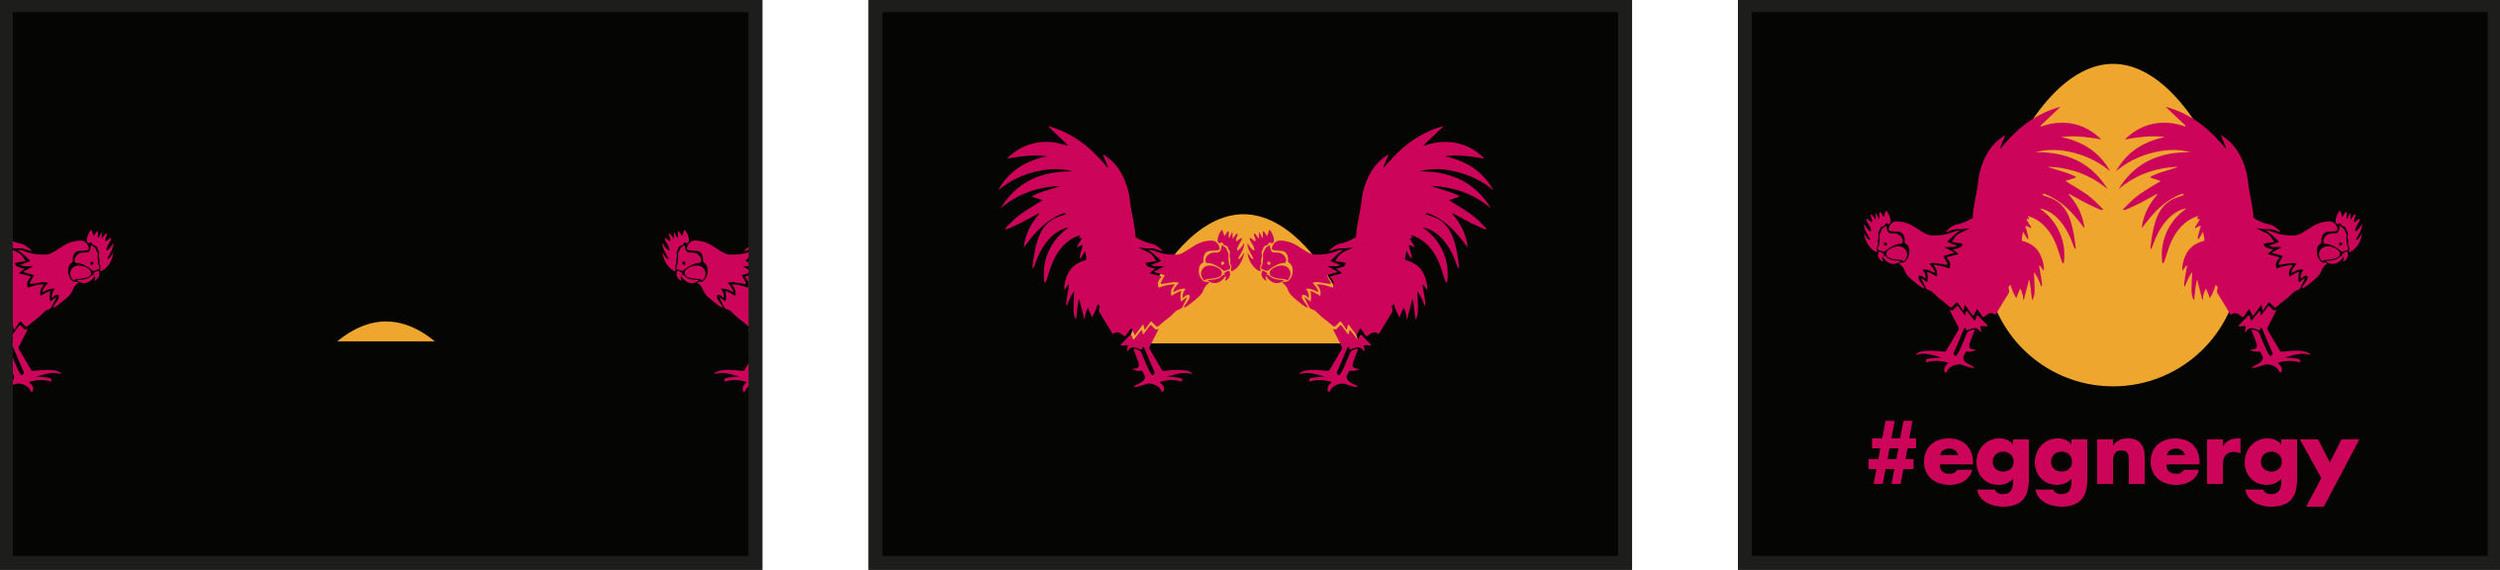 redbull logo sequence.jpg